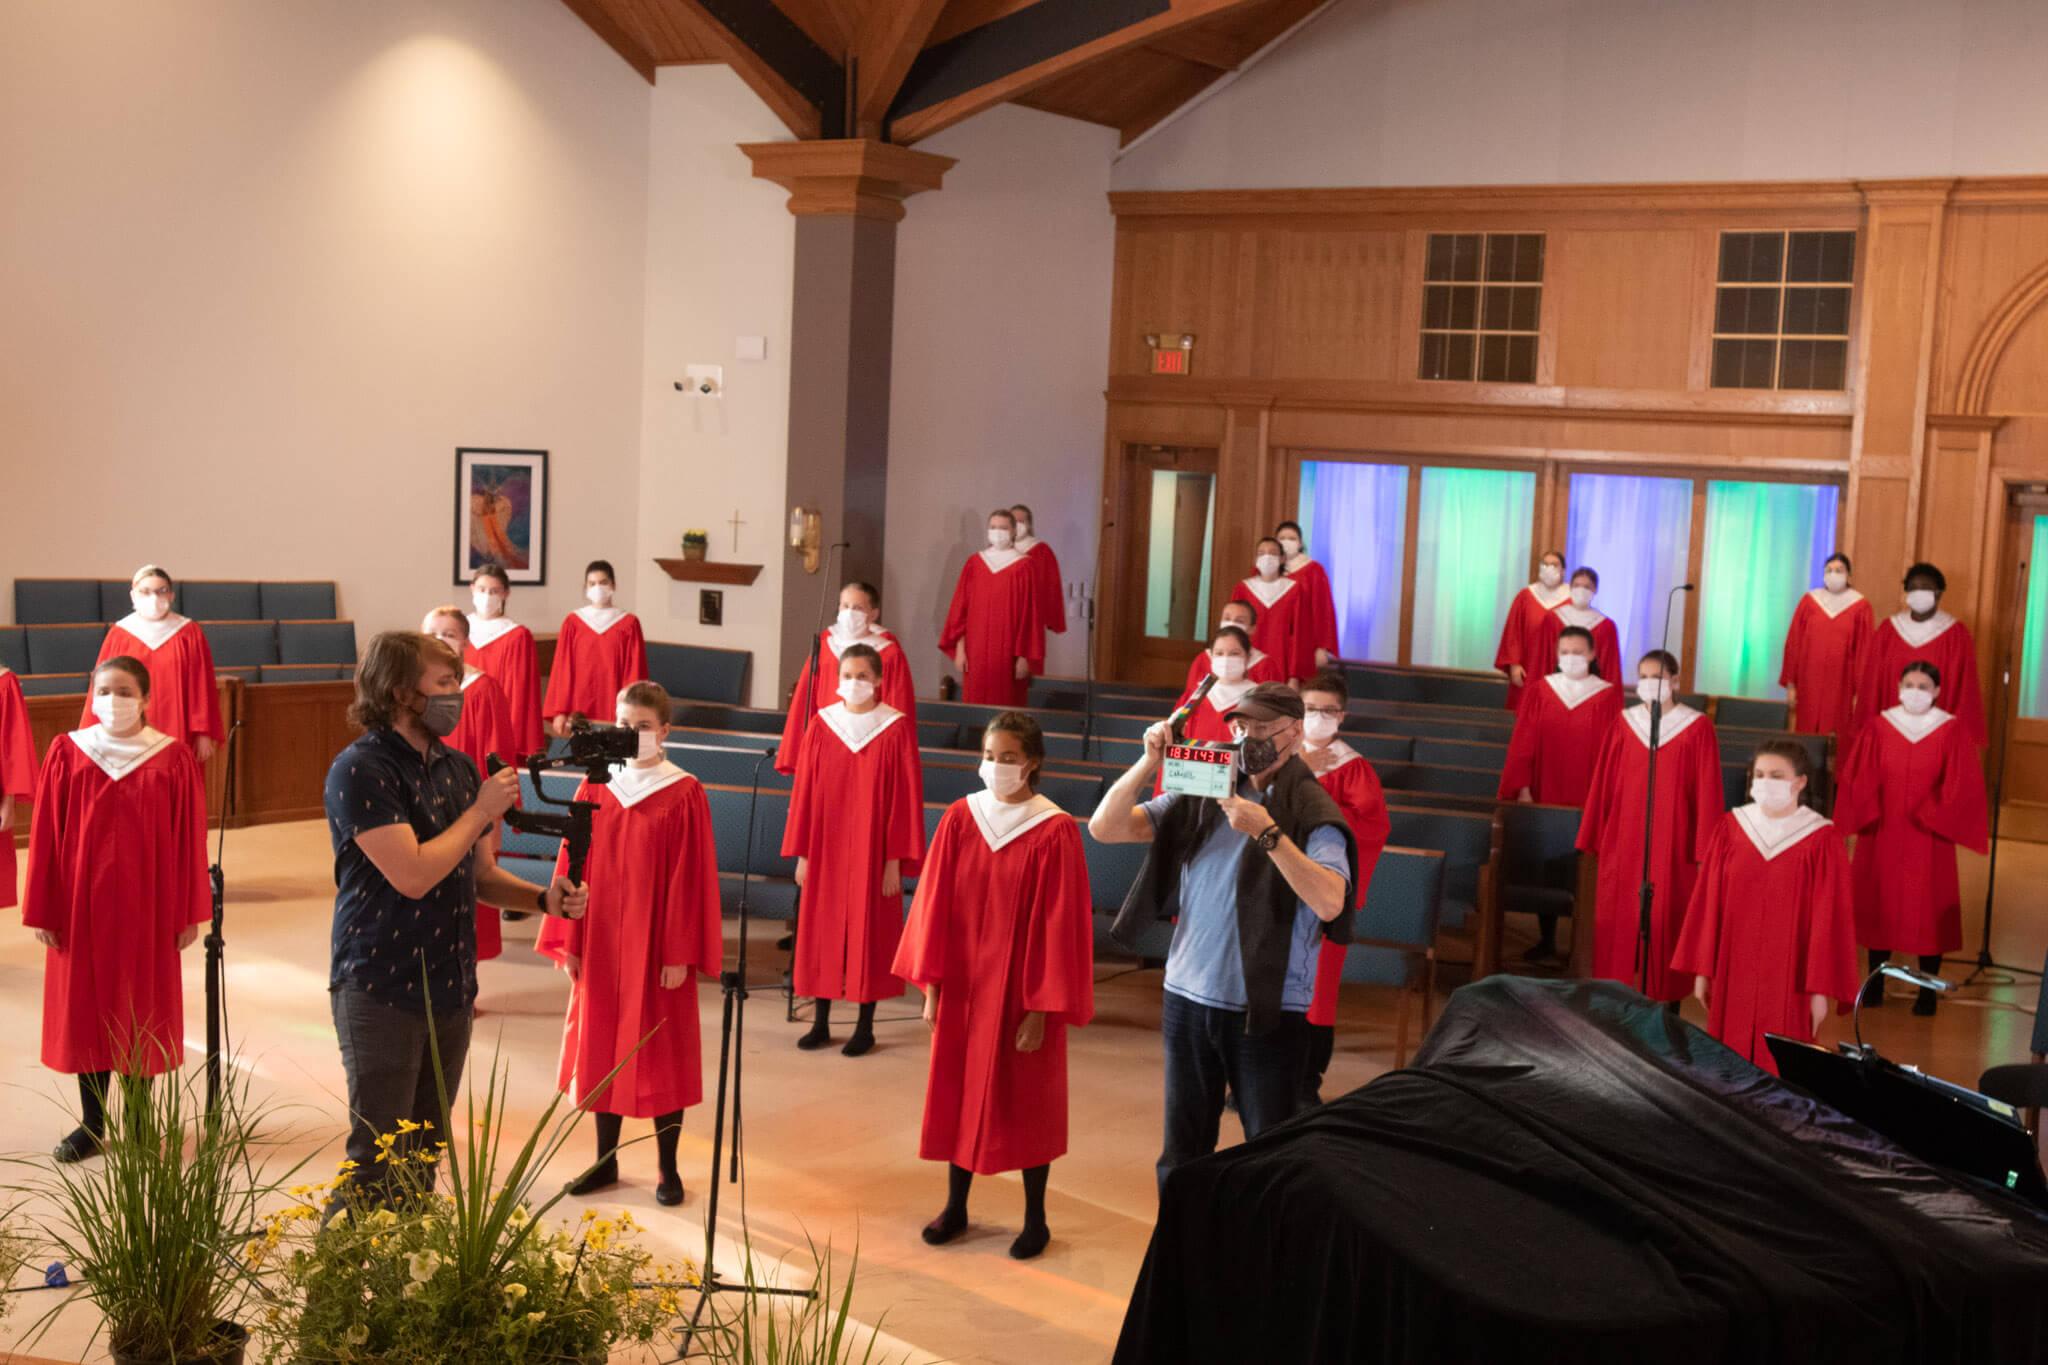 Concert Choir Spring Sing-Along Concert Photo